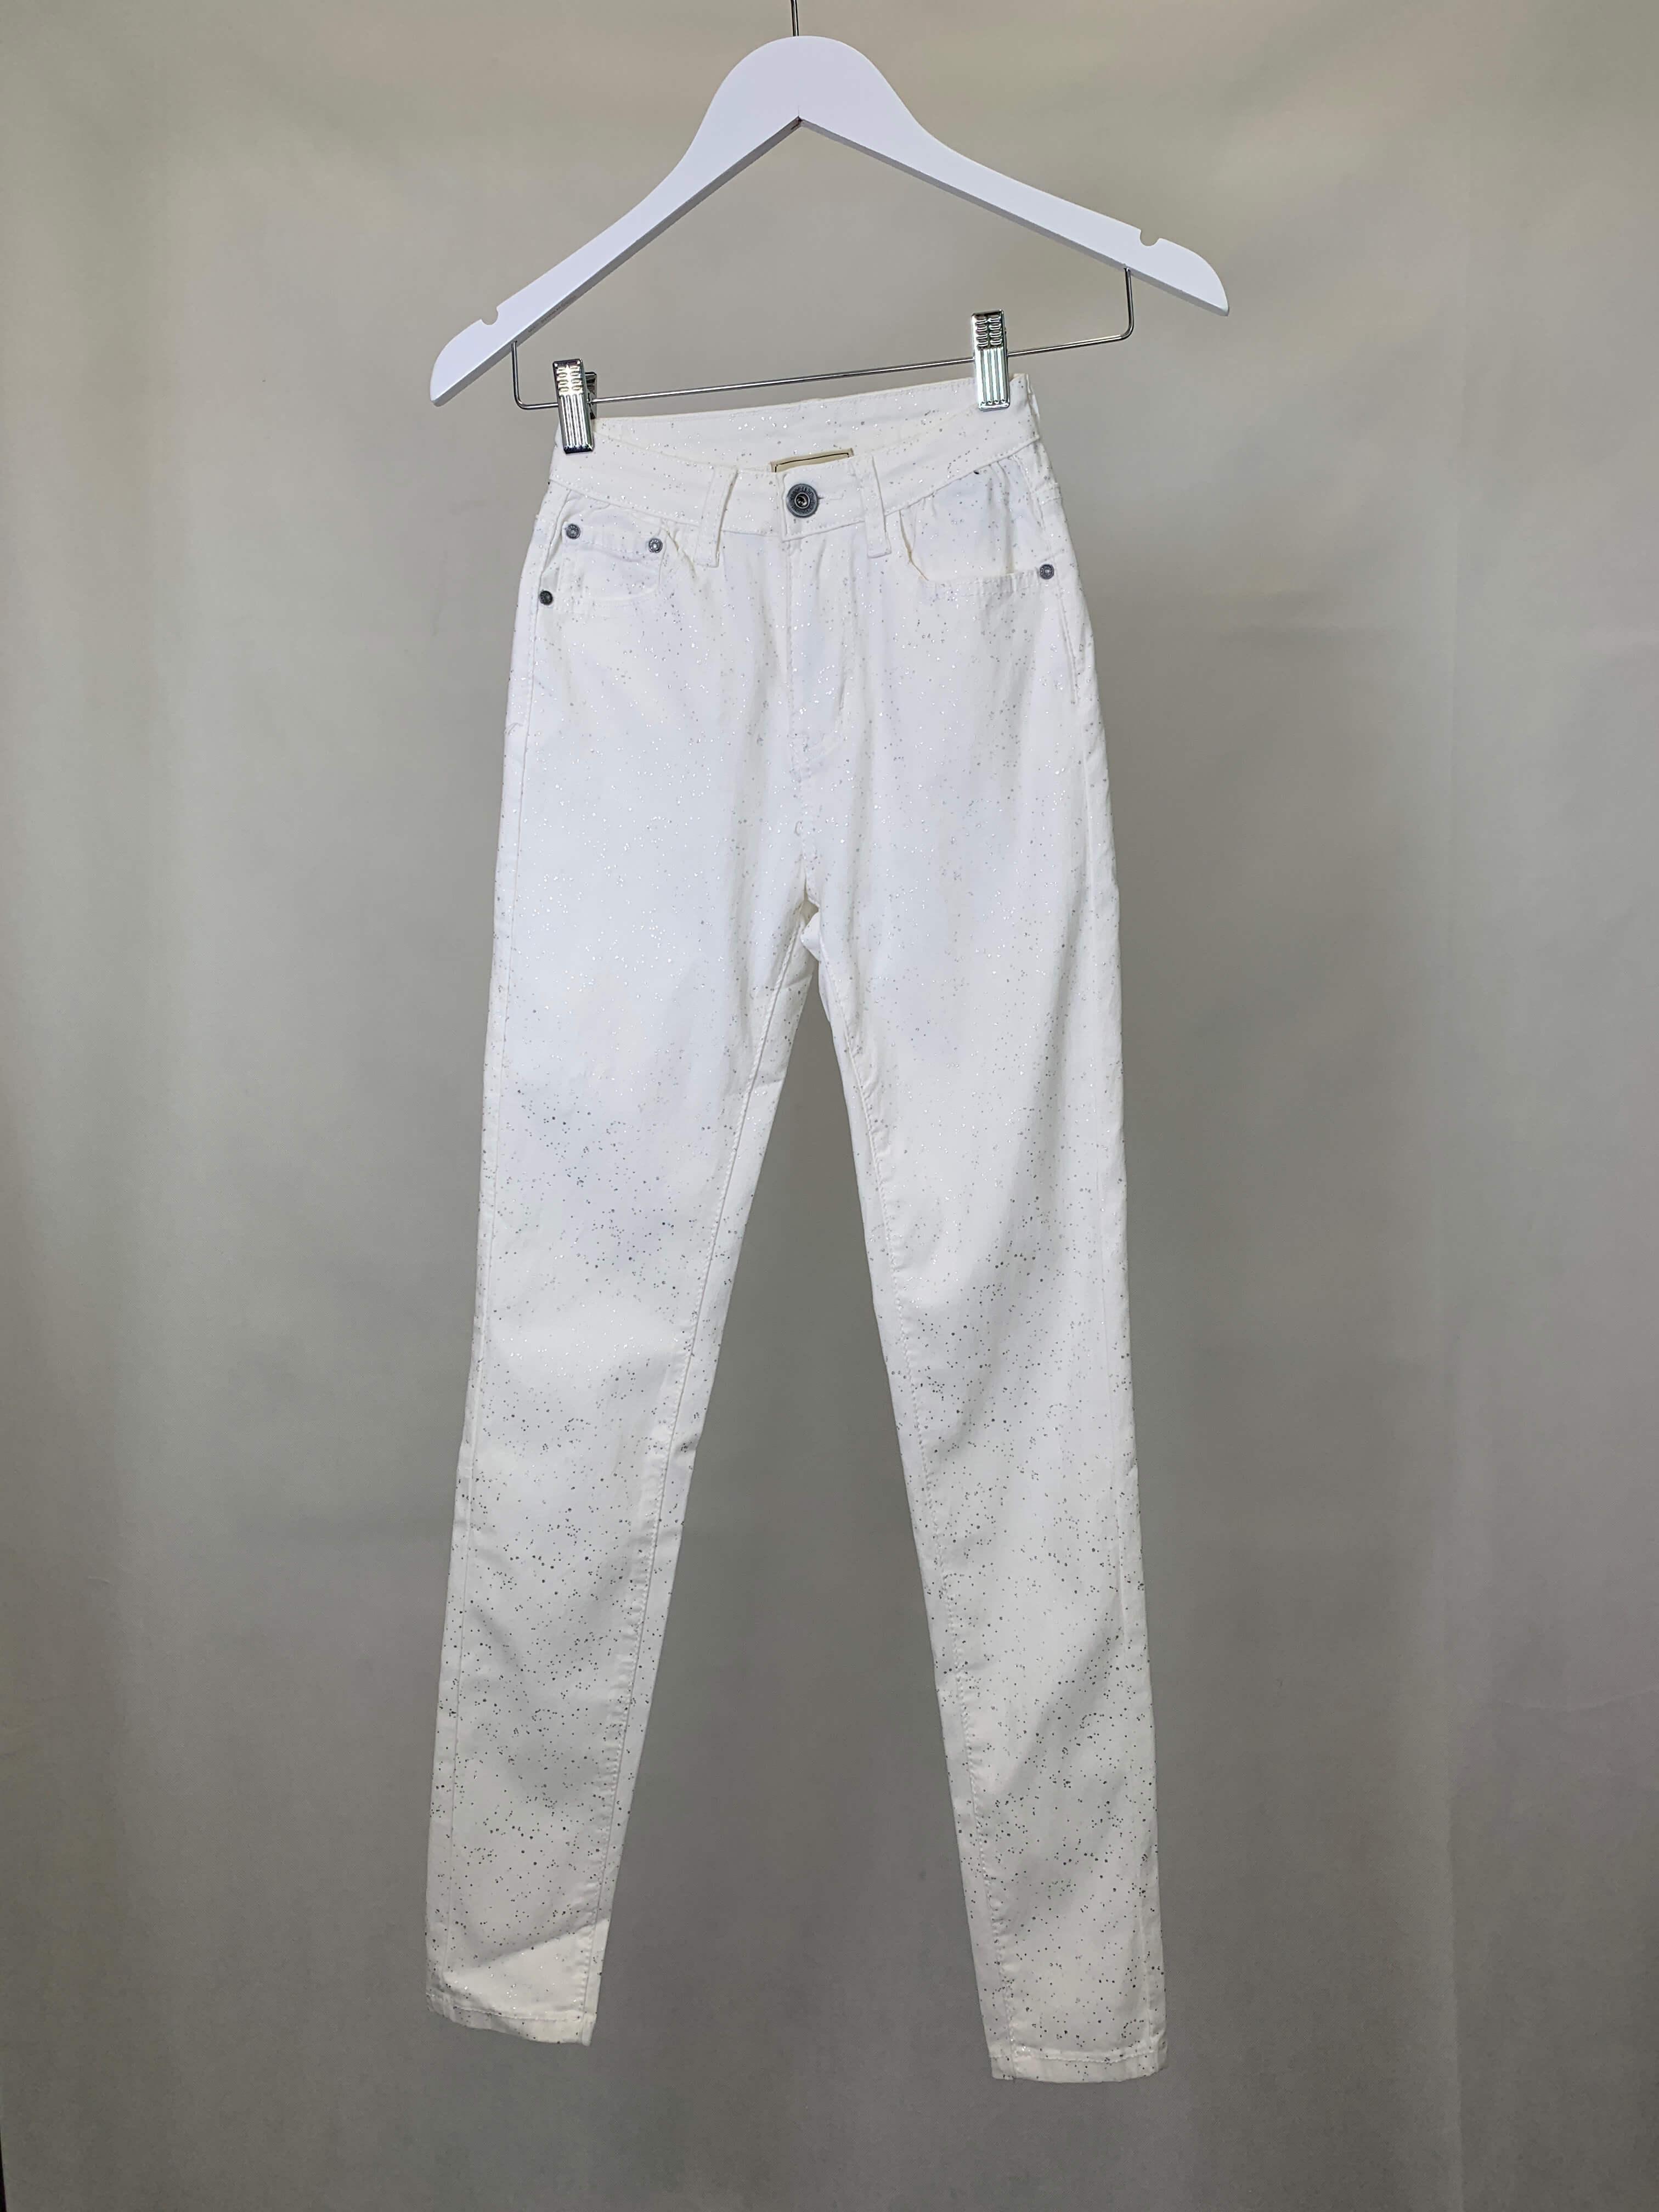 Jeans weiss silber Aplikationen